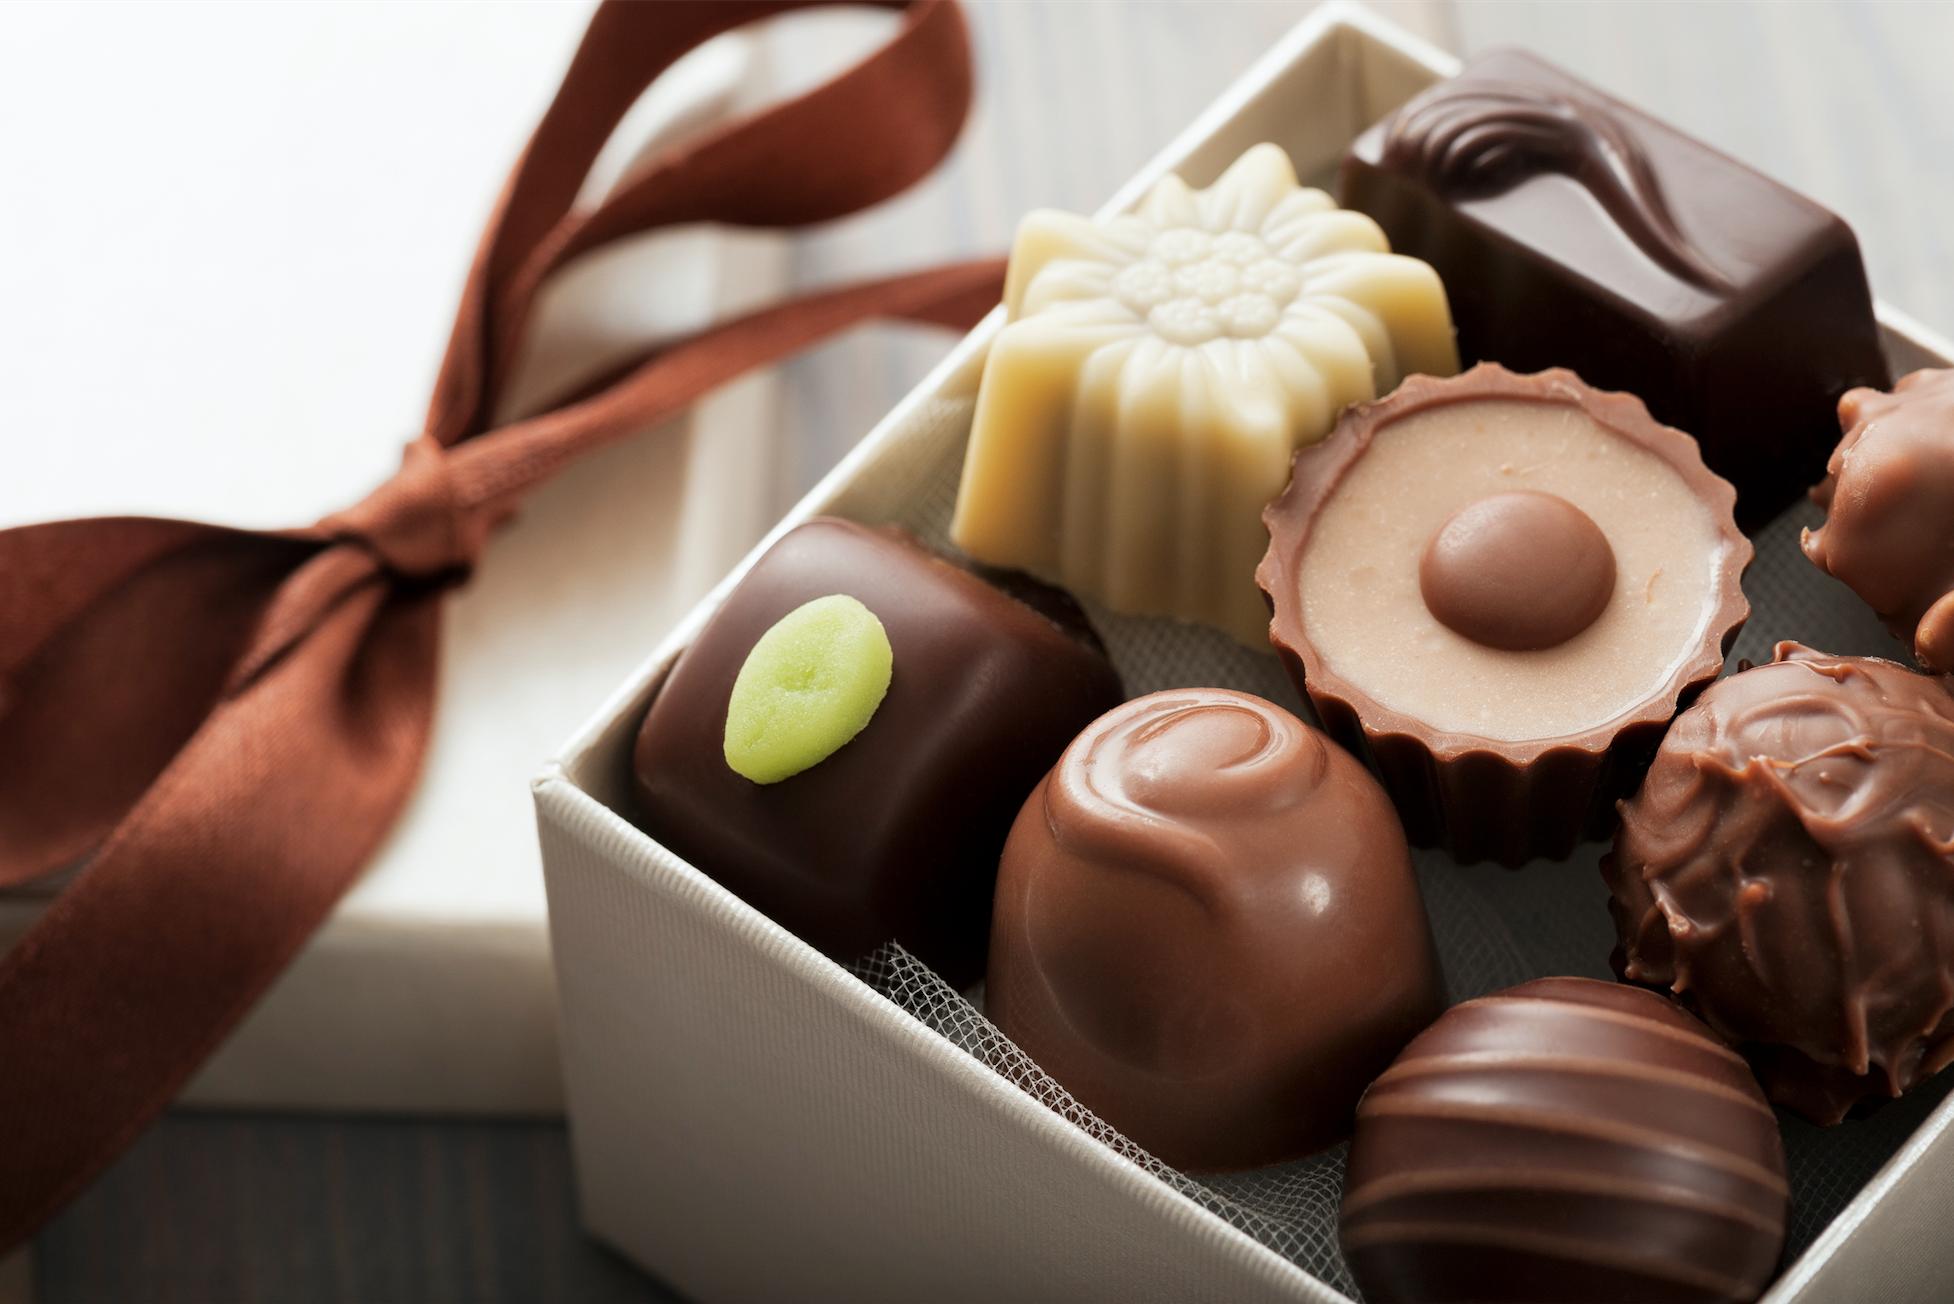 Bar Boulud Hosts Chocolate Shop Pop-Ups this February [02/07/17]